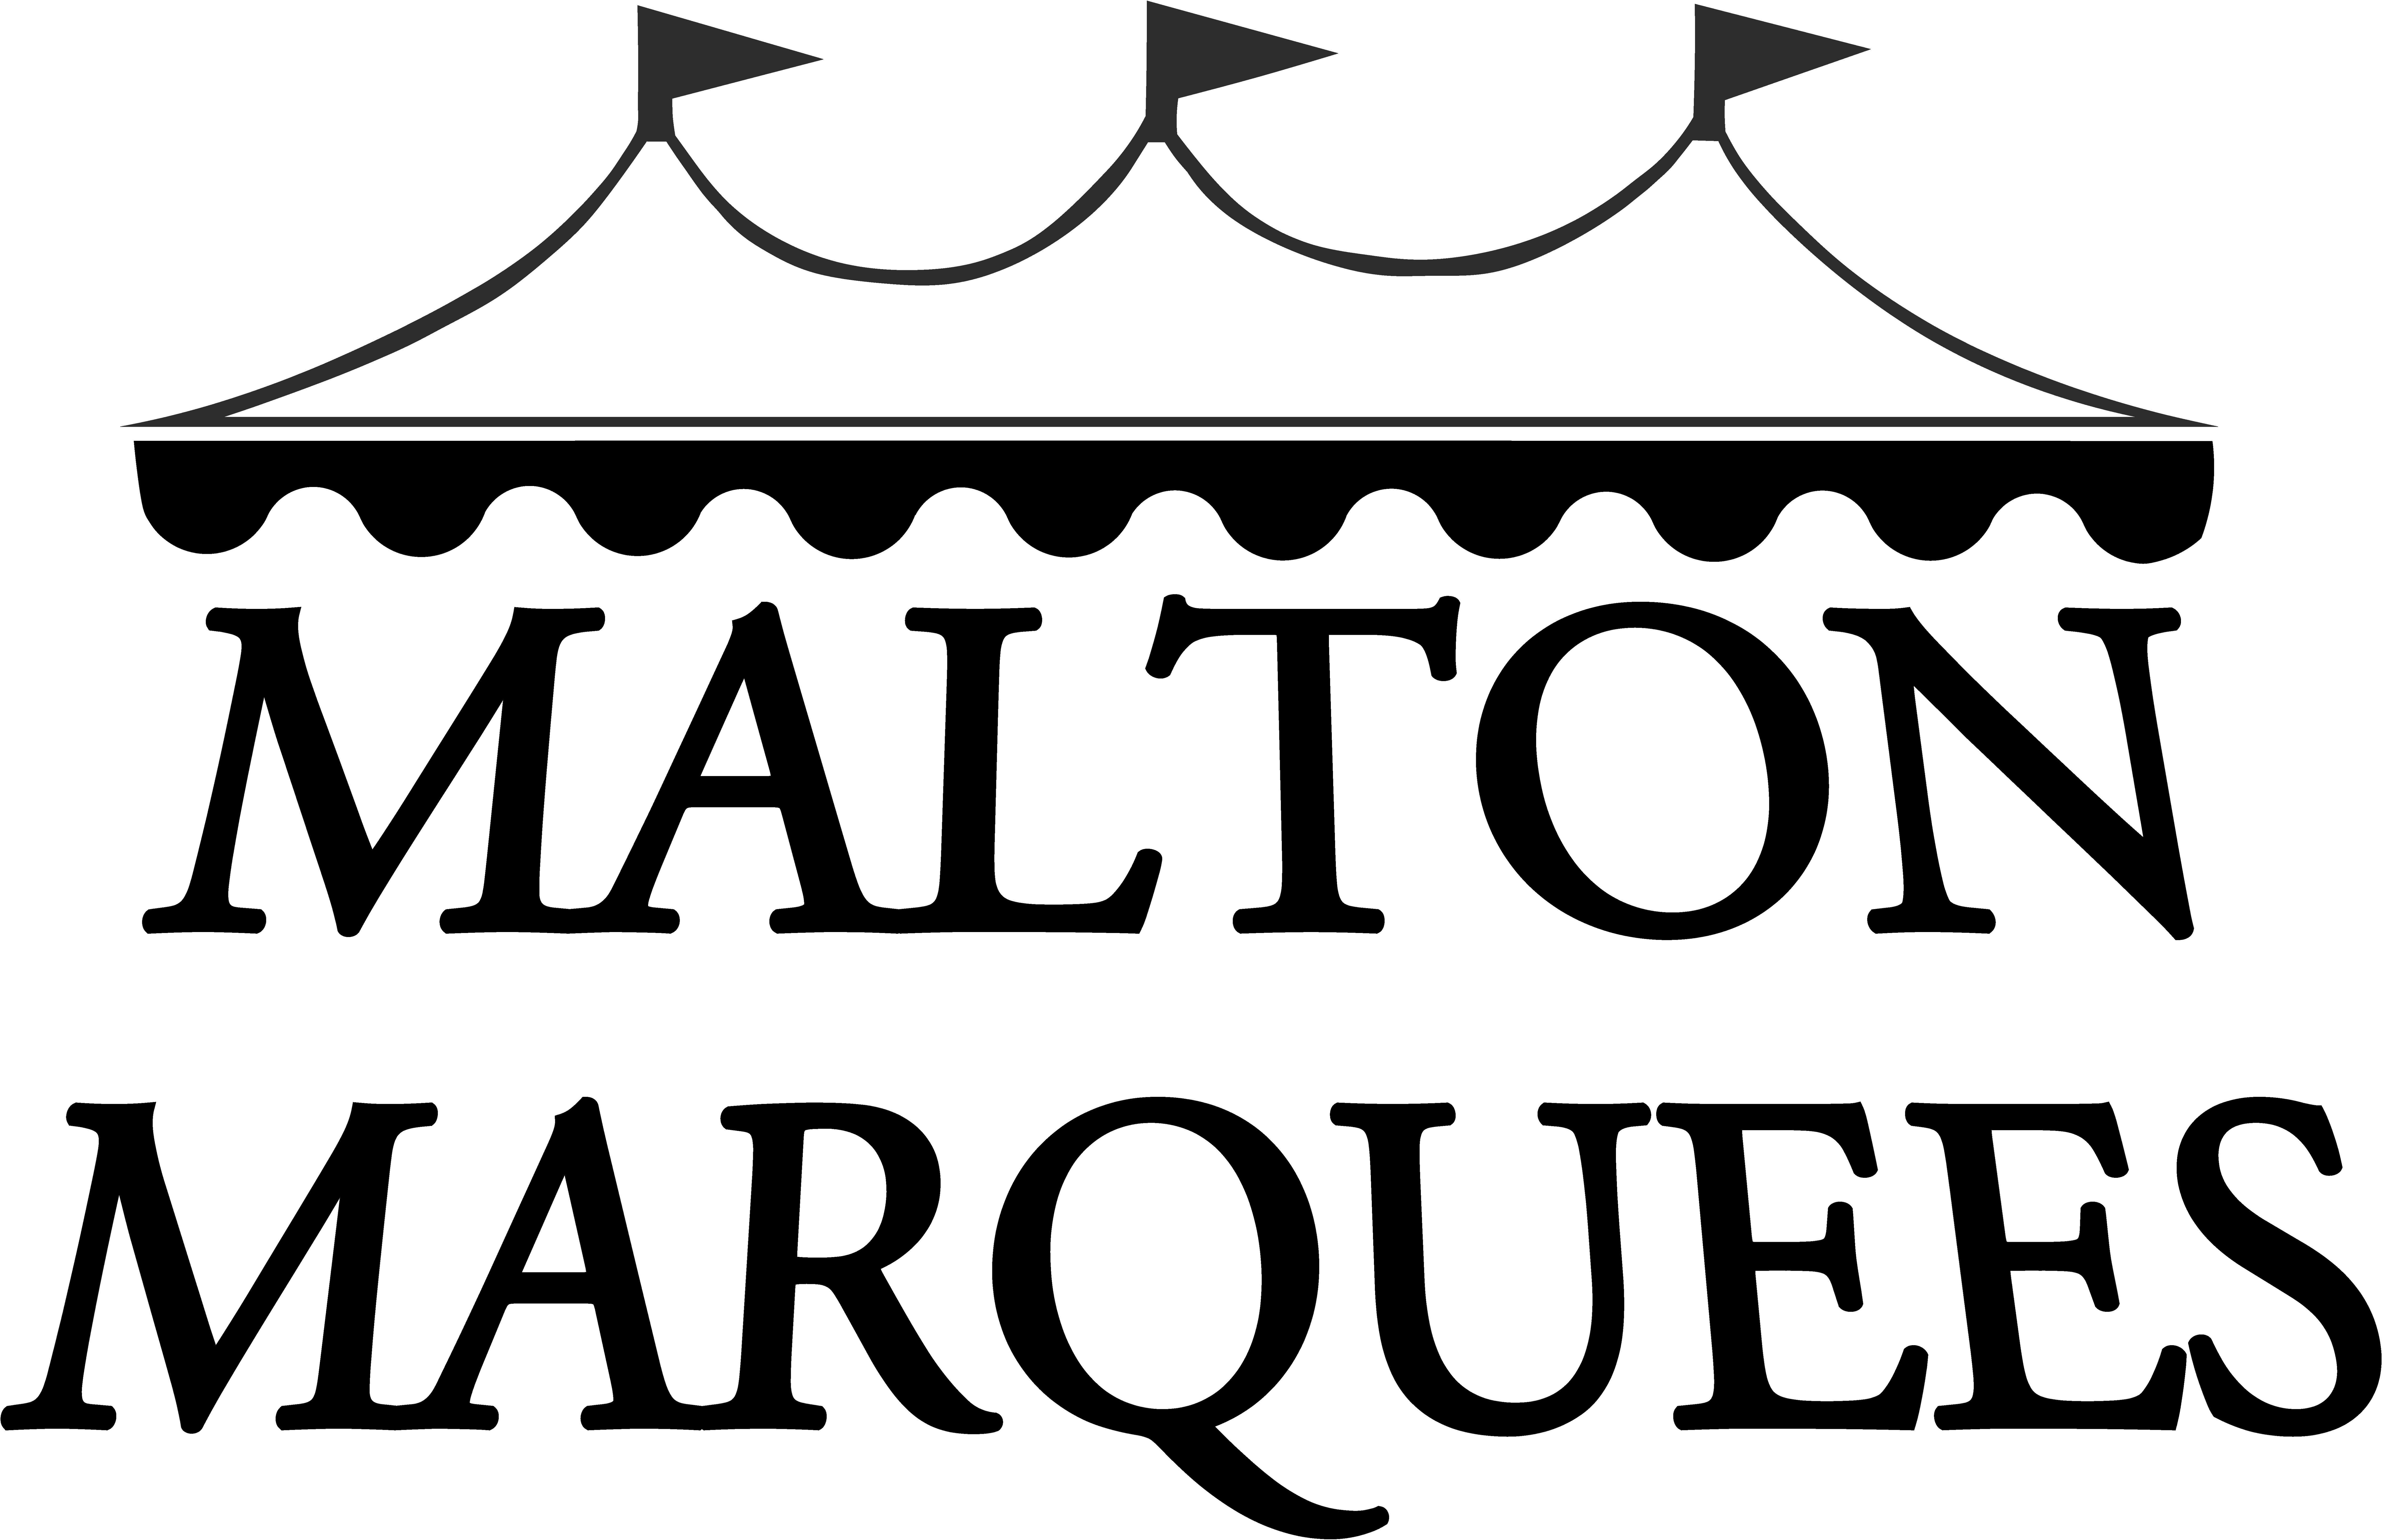 Malton-Marquees-PDF-logo-1-pdf